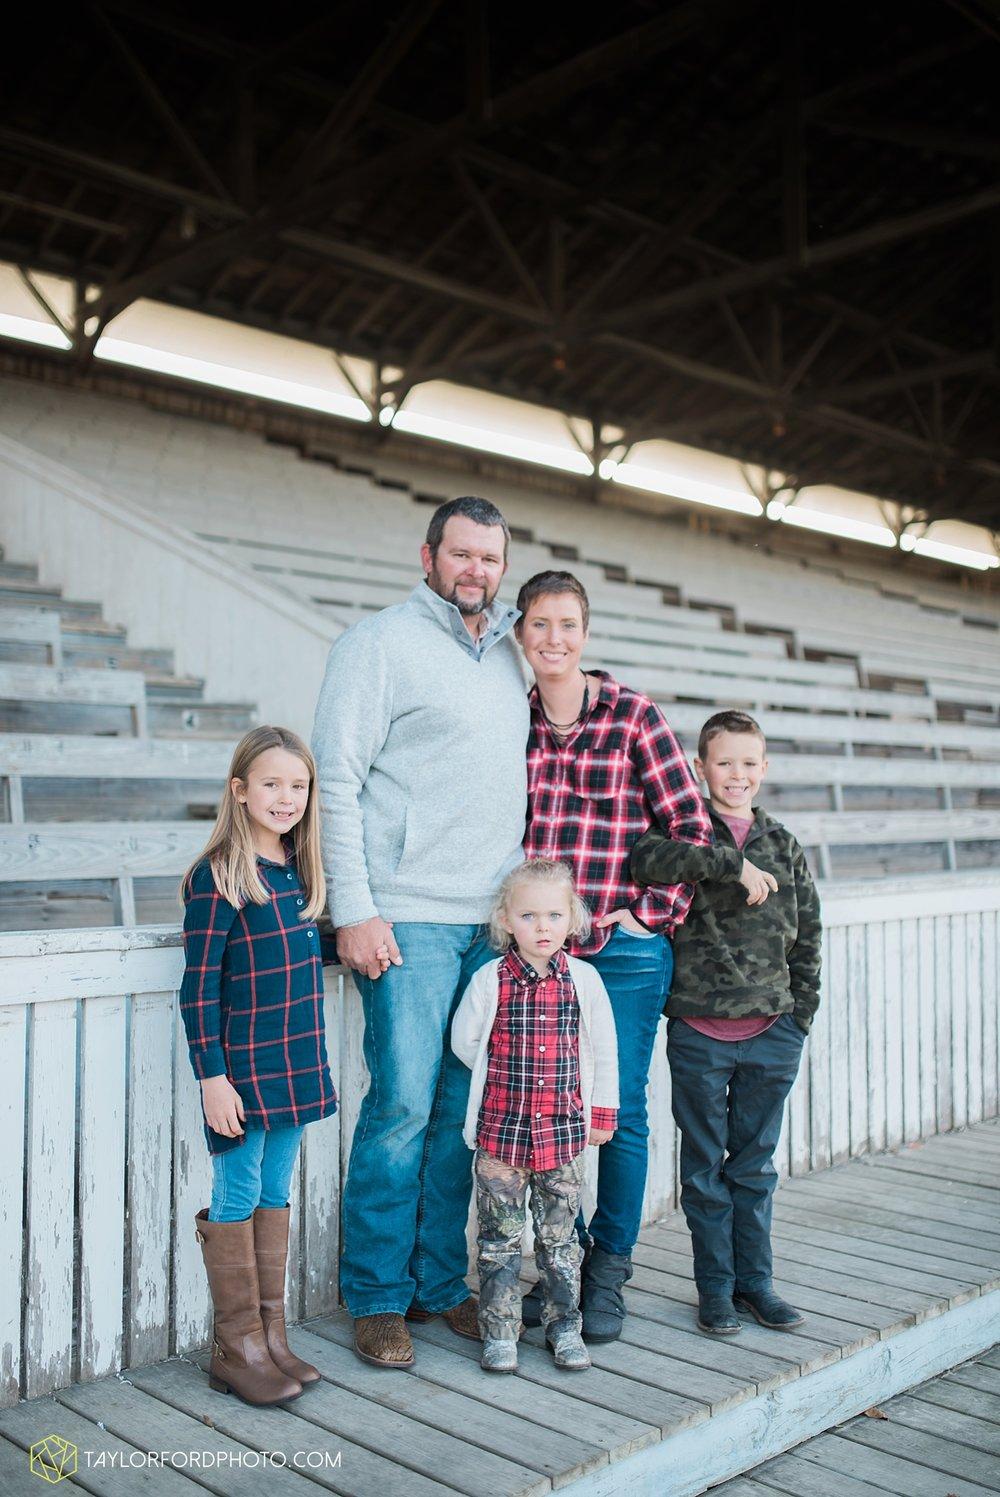 van_wert_ohio_photographer_the_baxter_family_county_fairgrounds_taylor_ford_4015.jpg